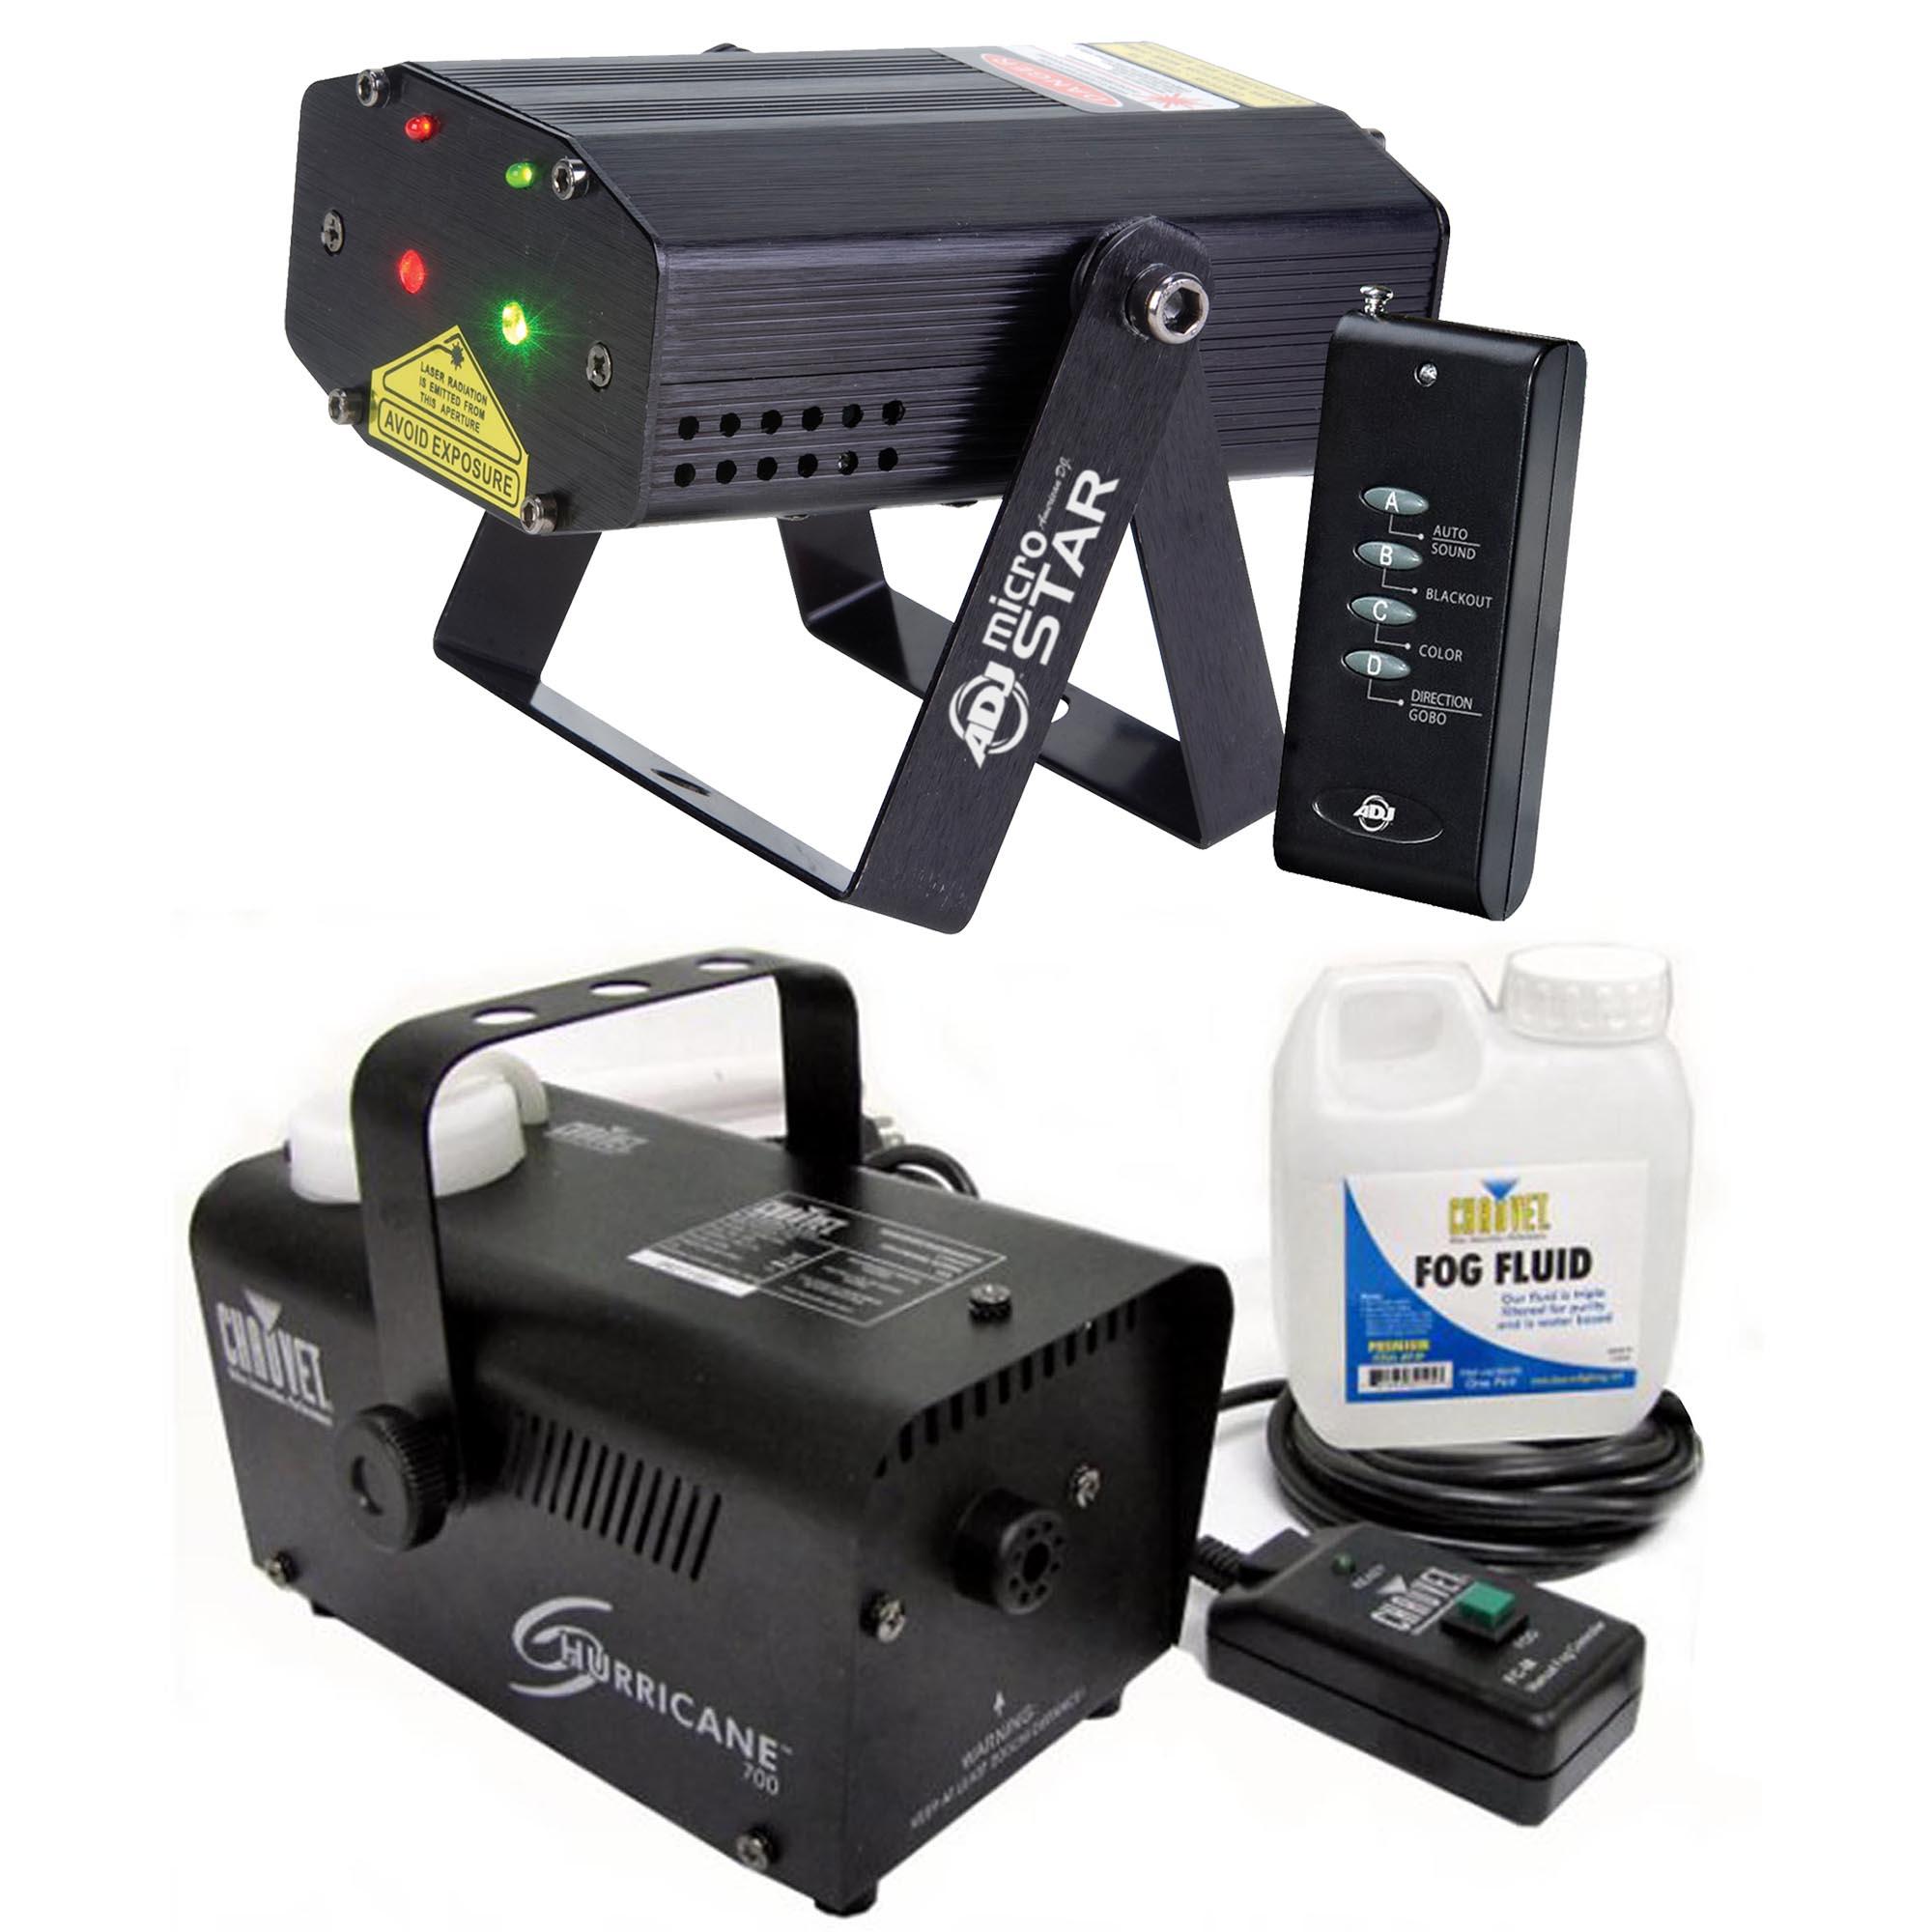 ADJ Micro Star Laser & Wireless Remote + Chauvet Fog Machine w  Fluid & Remote by